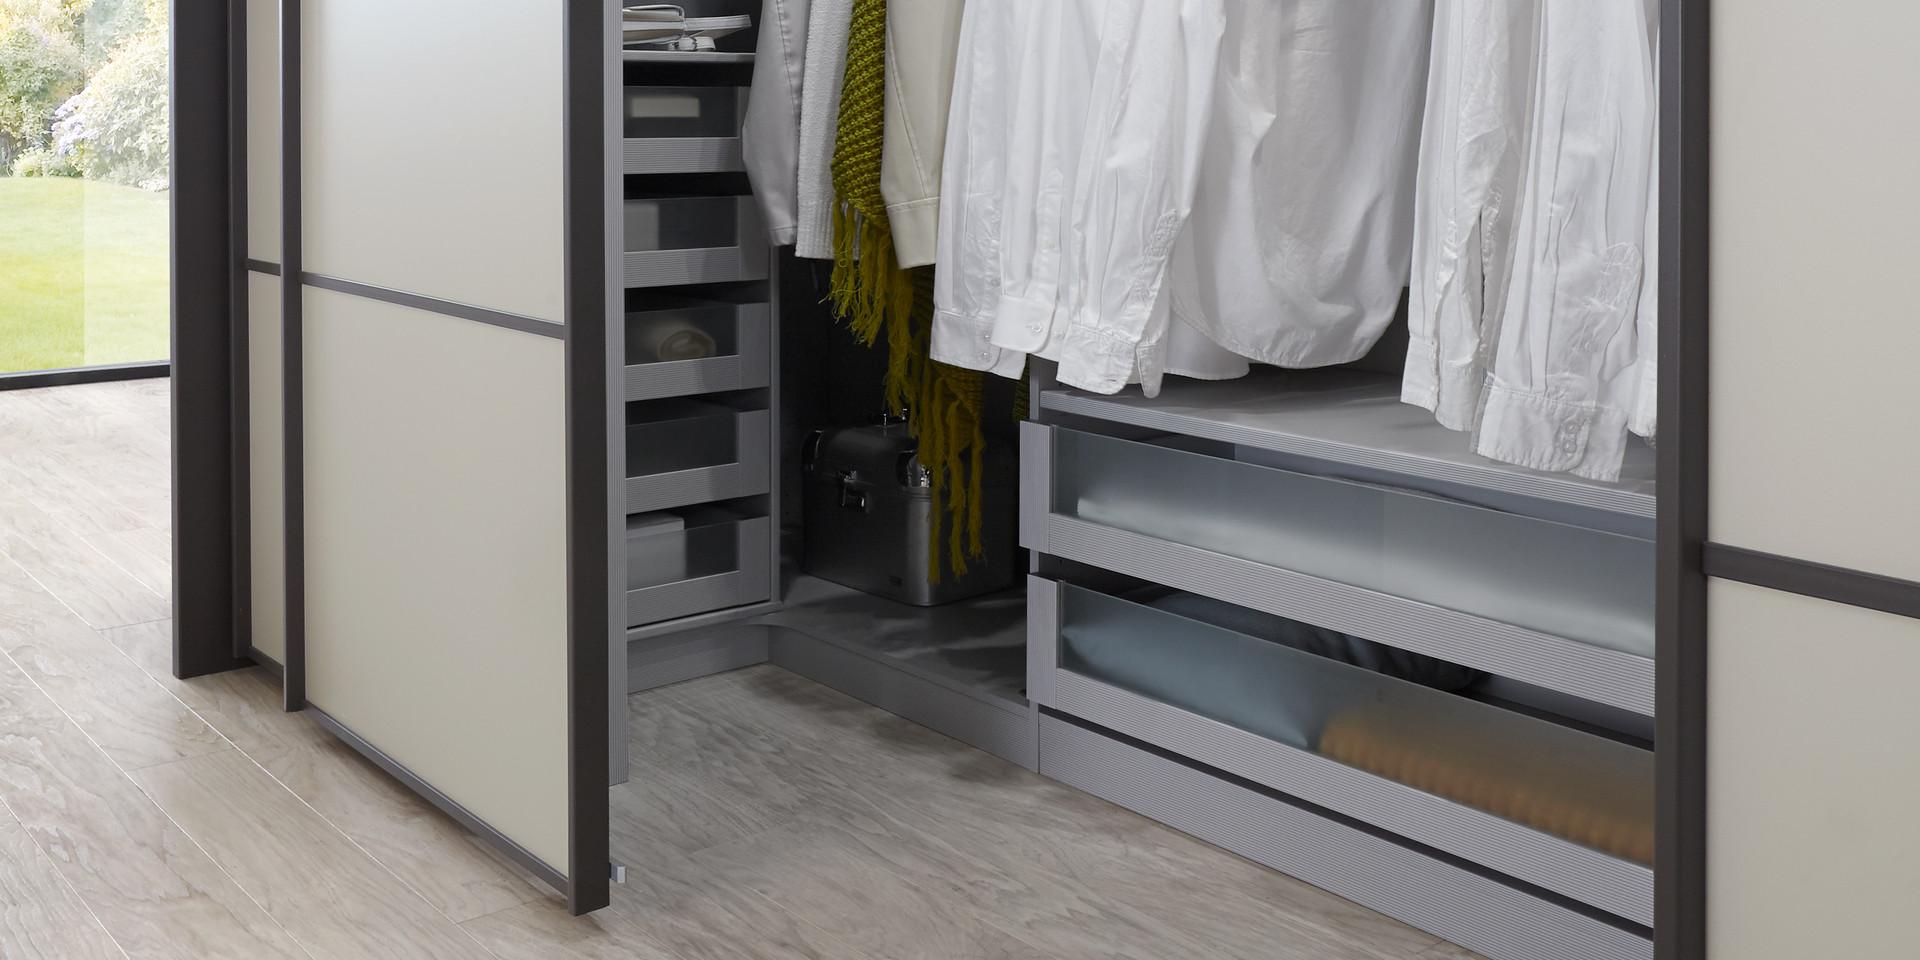 schwebet renschrank begehbar swalif. Black Bedroom Furniture Sets. Home Design Ideas